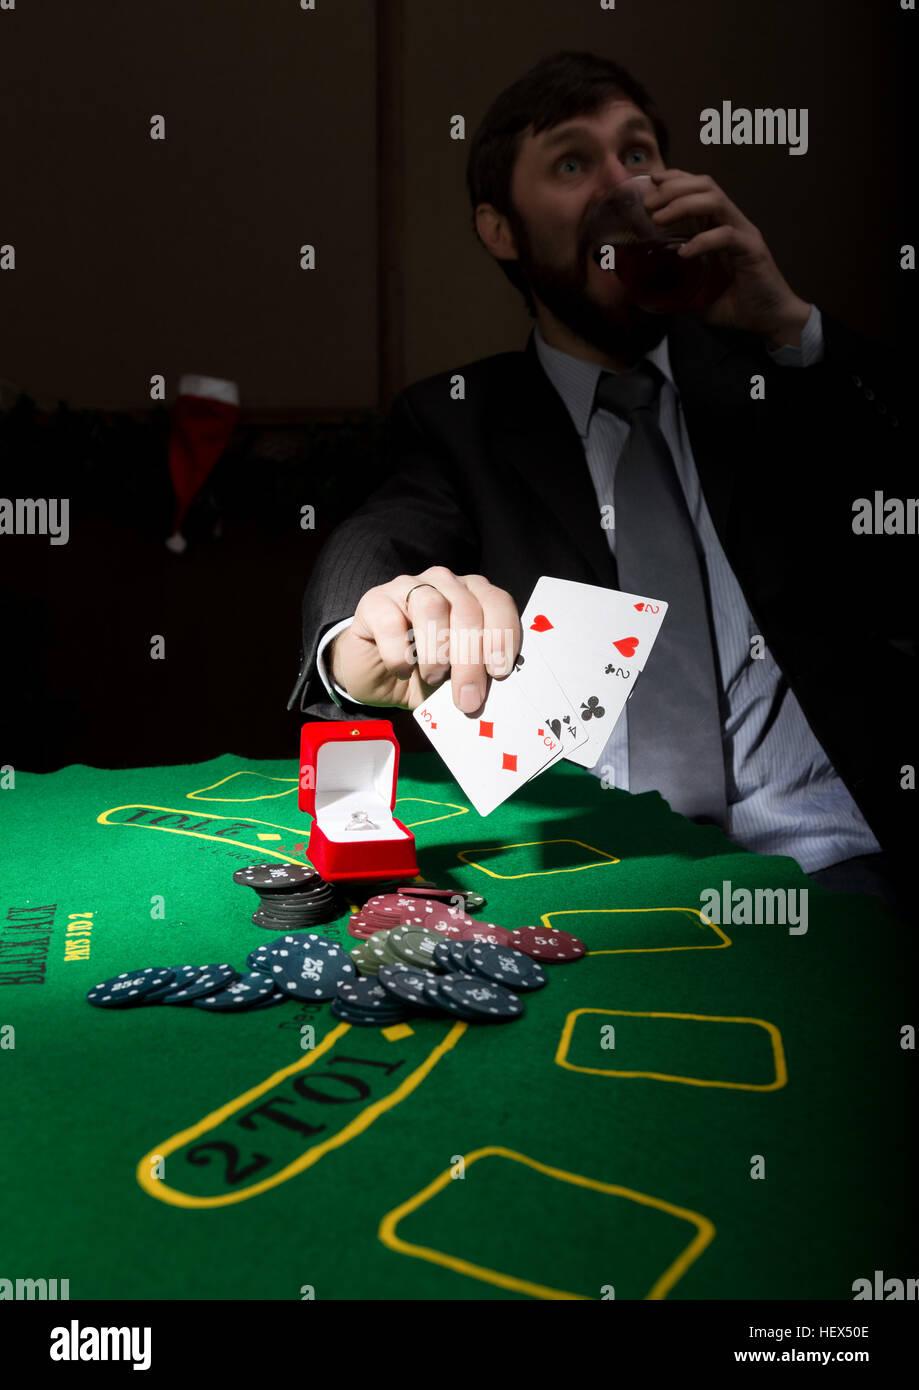 Brandy casino скачать gambling in paris